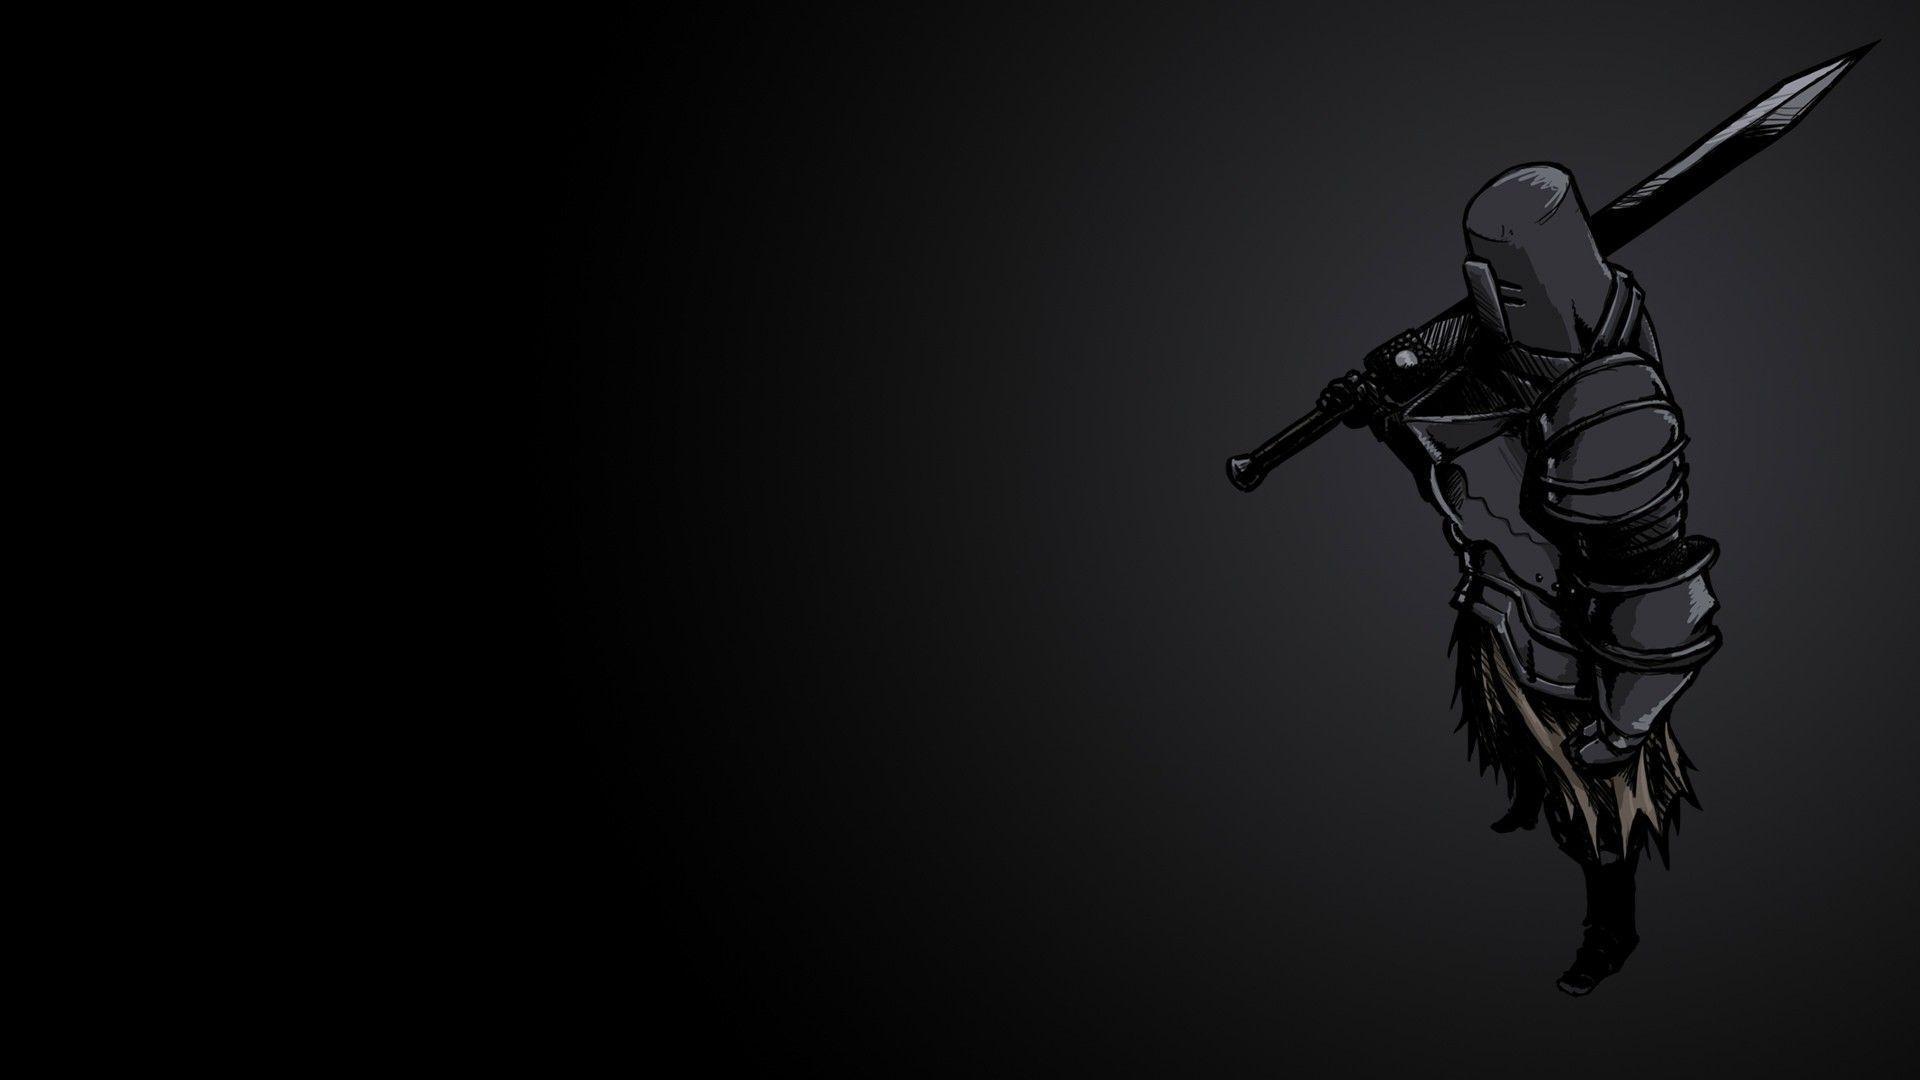 "1600x1000 Dark Angel Wallpapers, Good Photos | Dark Angel HD Widescreen ..."">"